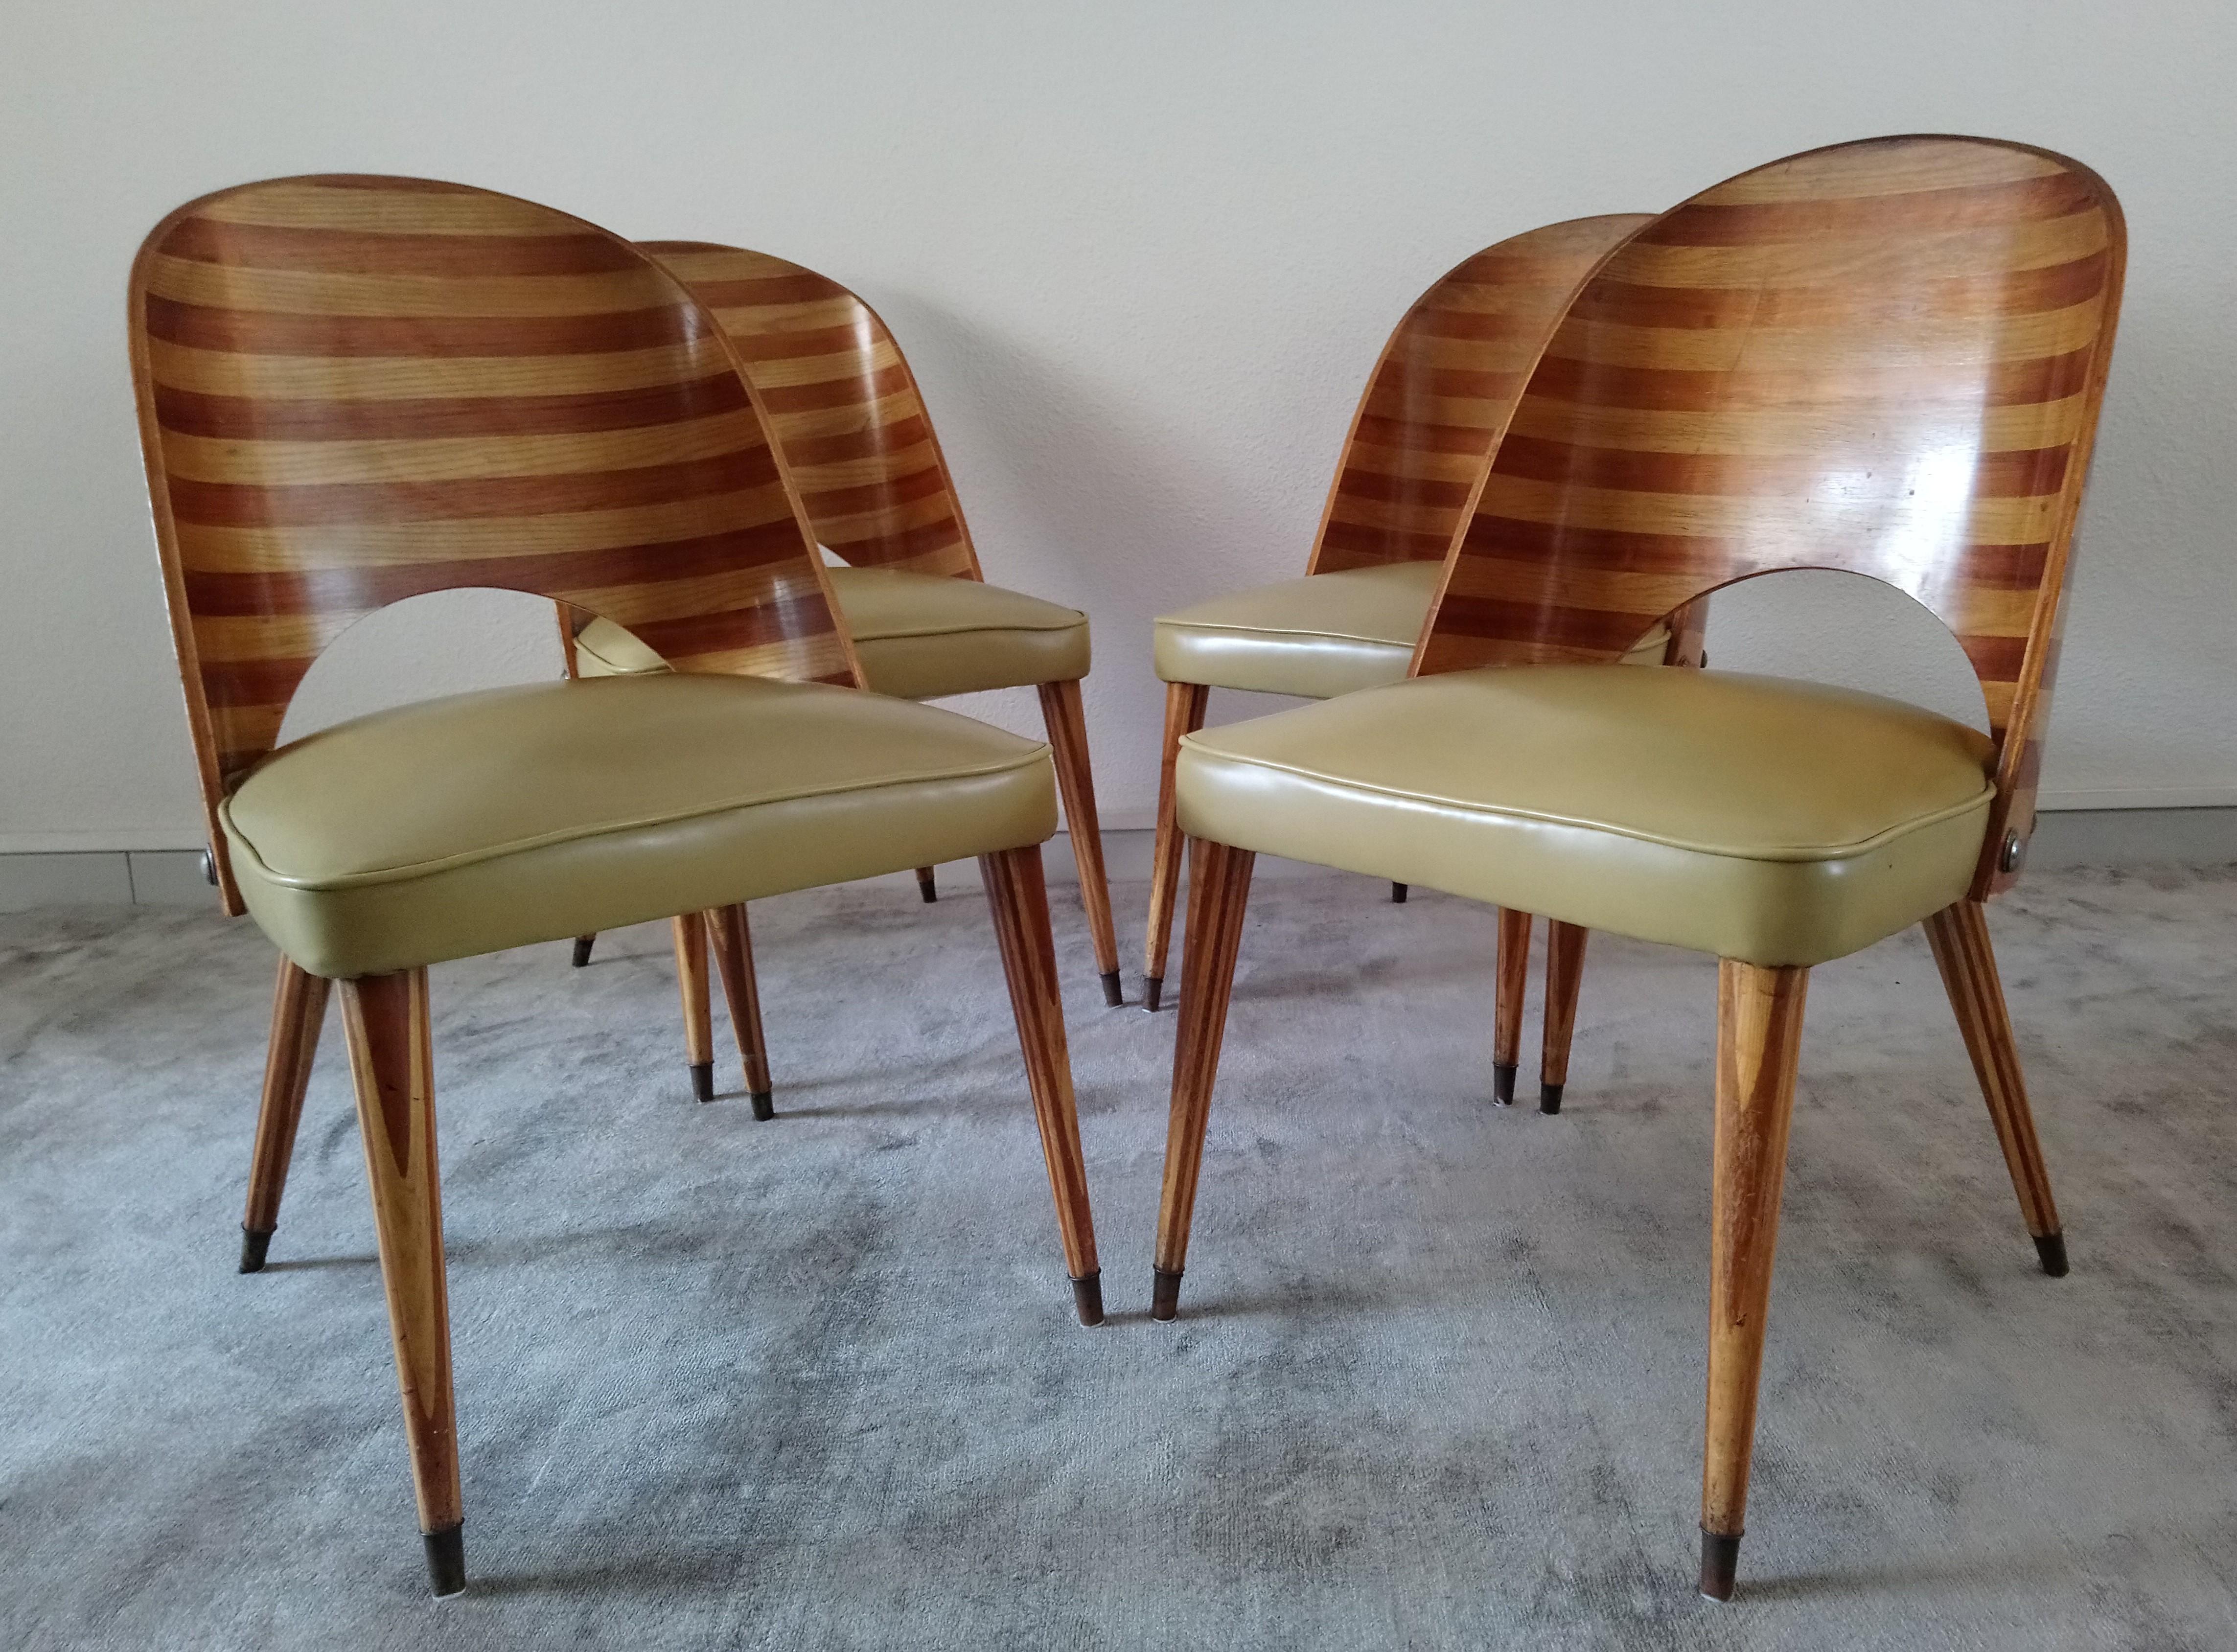 ... Vintage Barrel Chairs   1950s. Previous Next